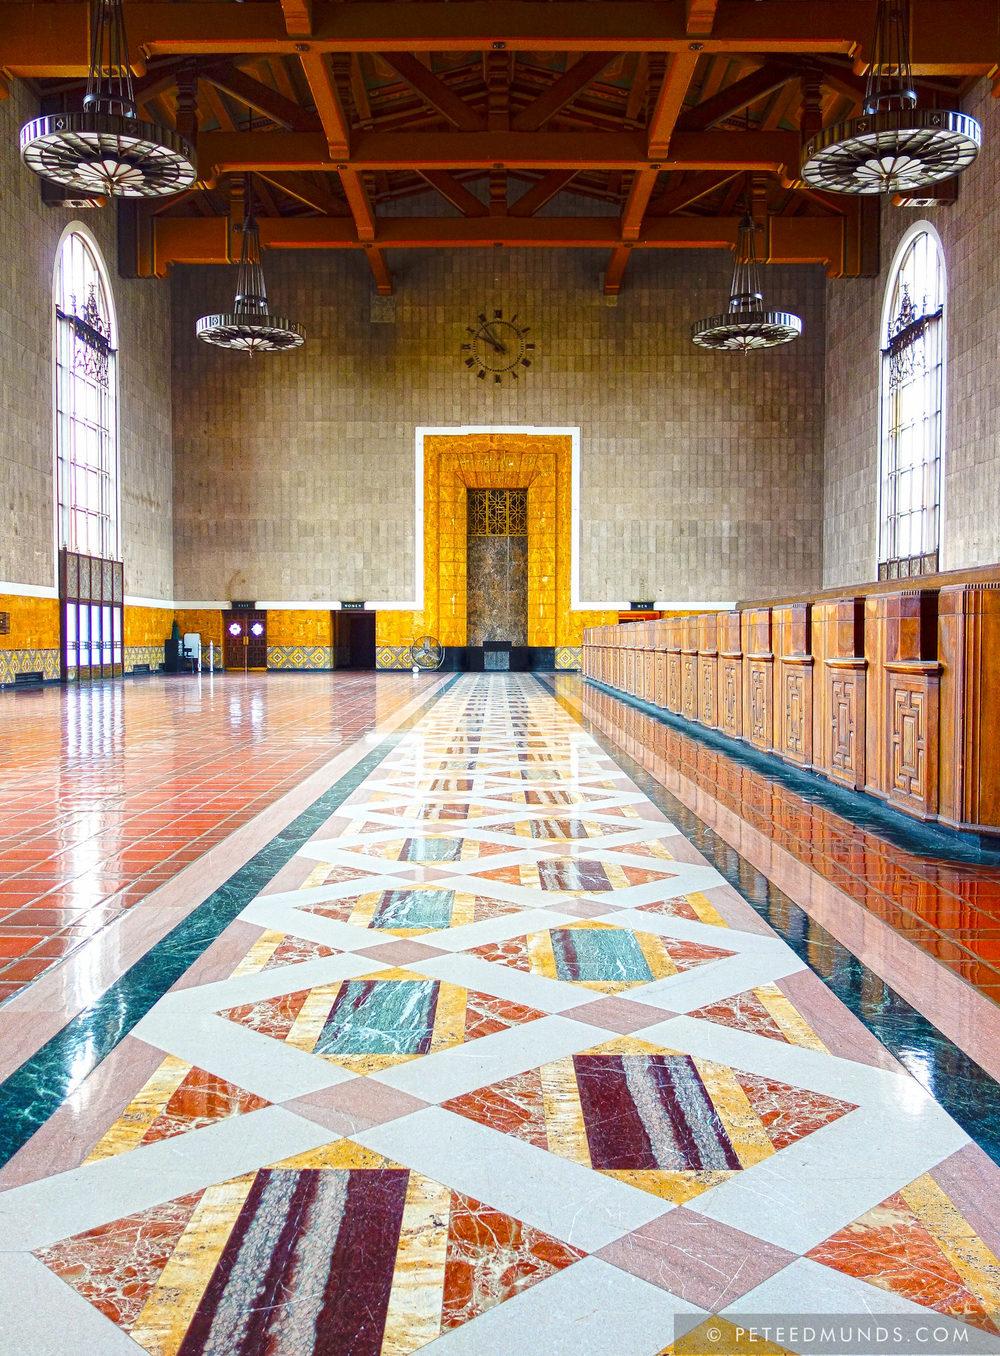 Old Ticketing Hall - Union Station - LA | HDR